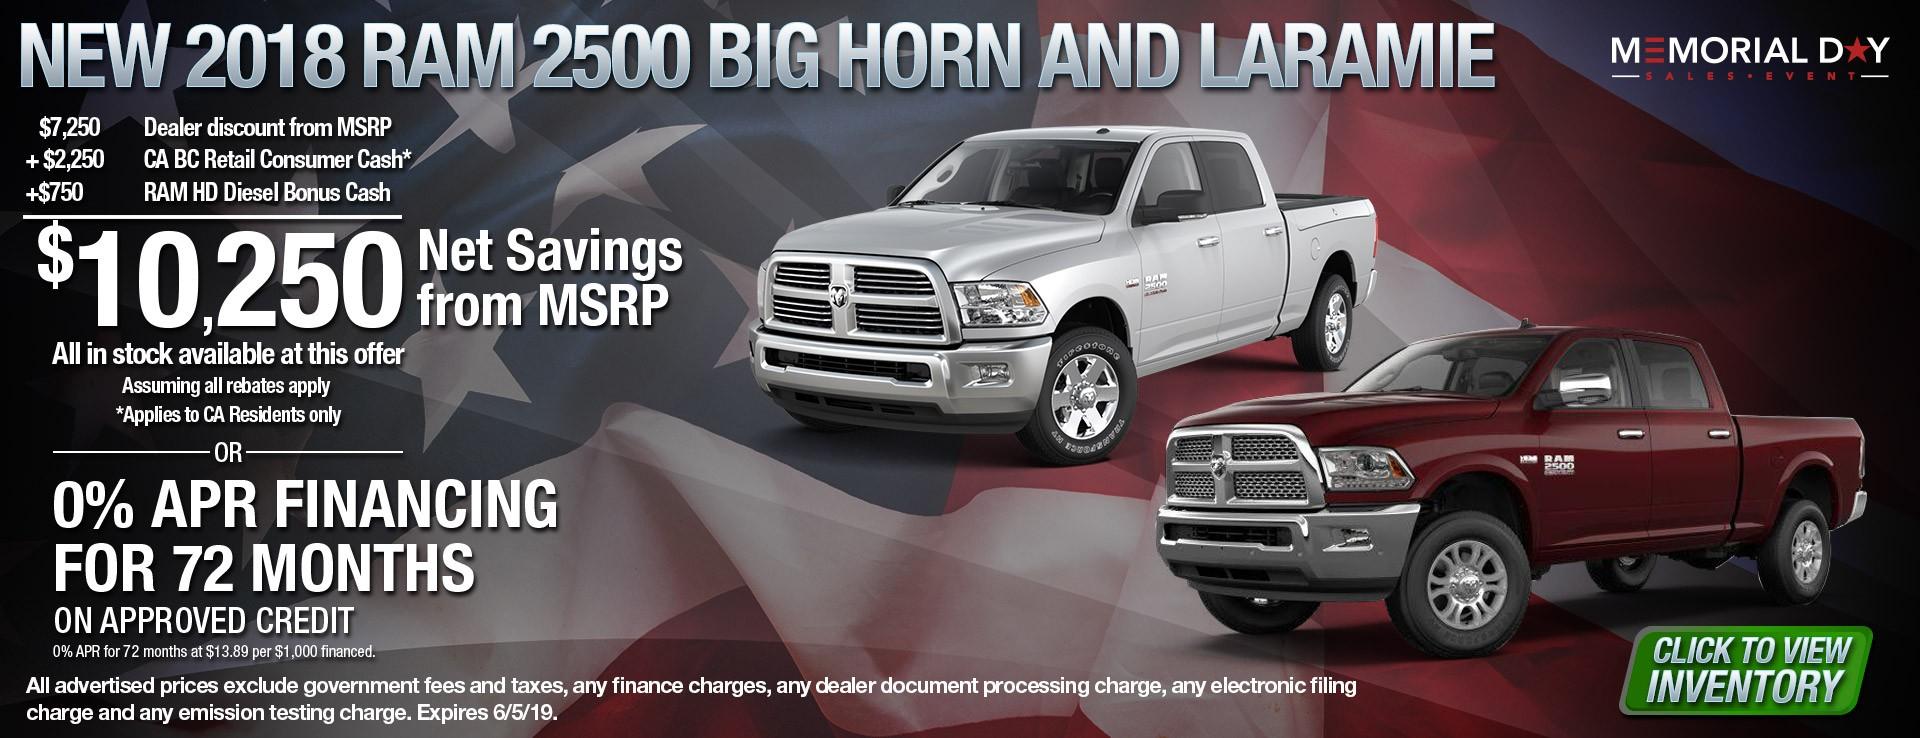 18 Big horn and Laramie